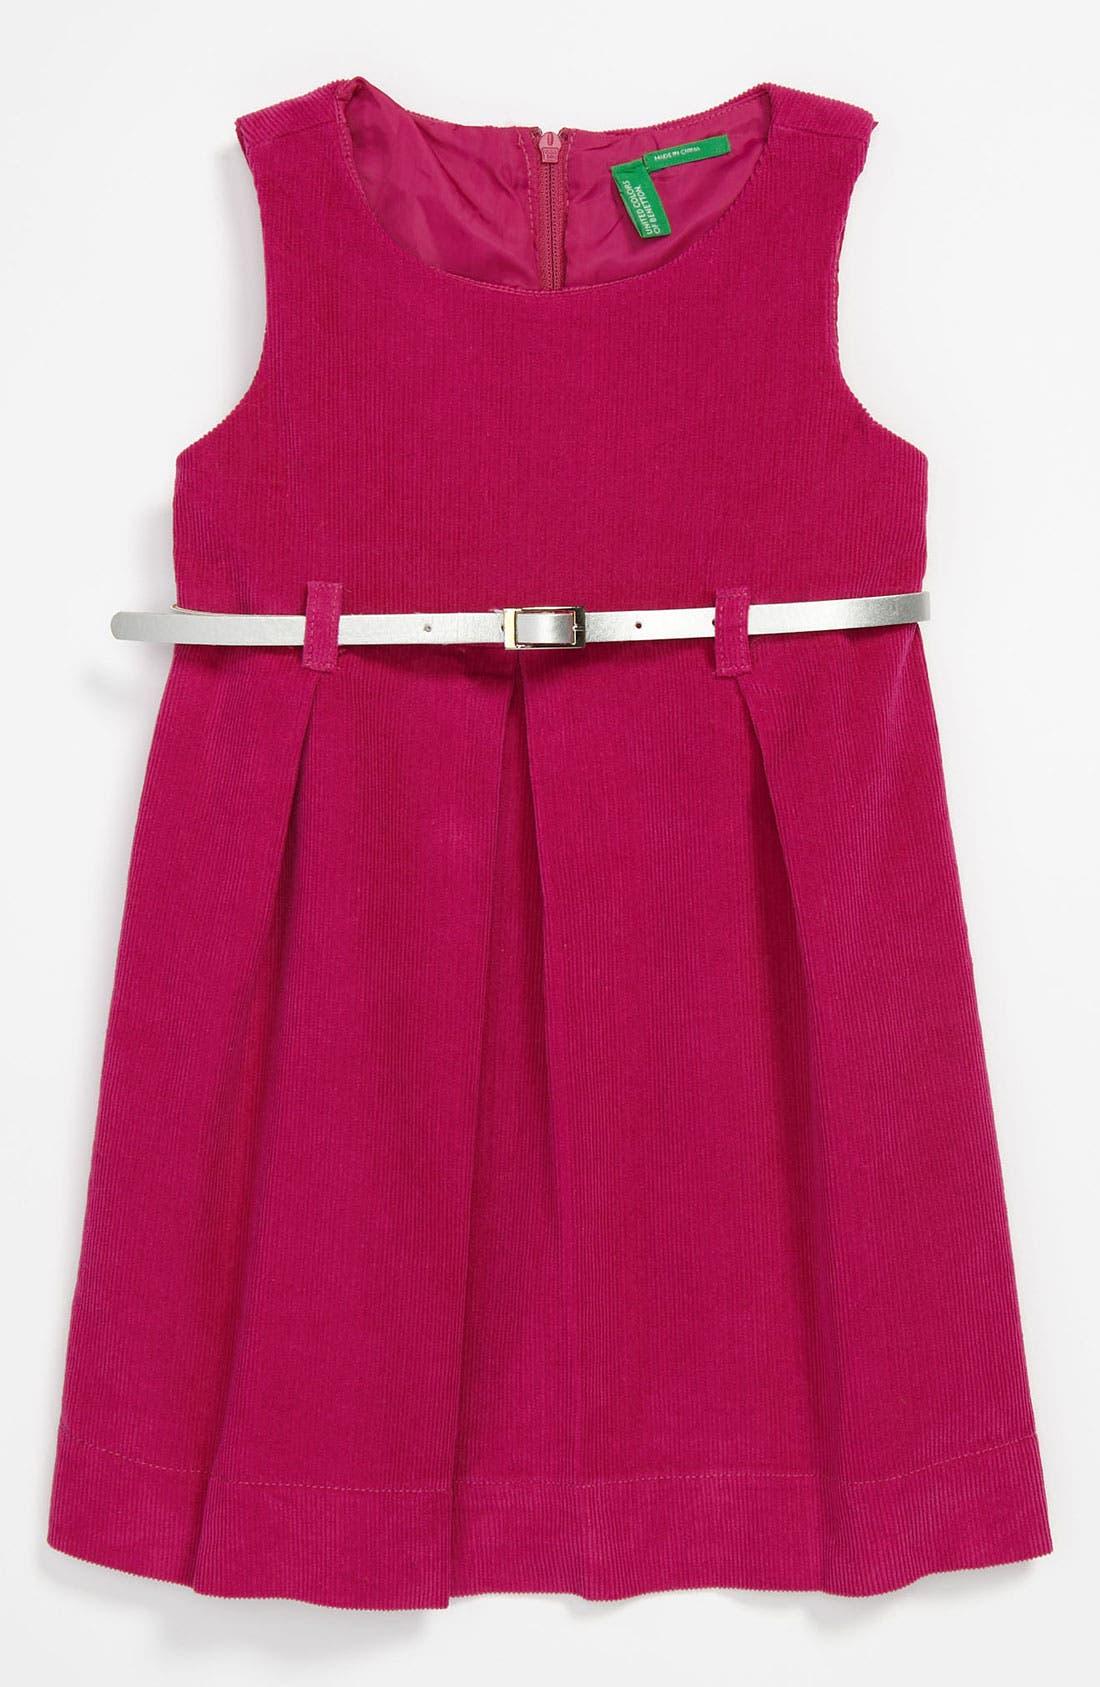 Main Image - United Colors of Benetton Kids Corduroy Dress (Infant)